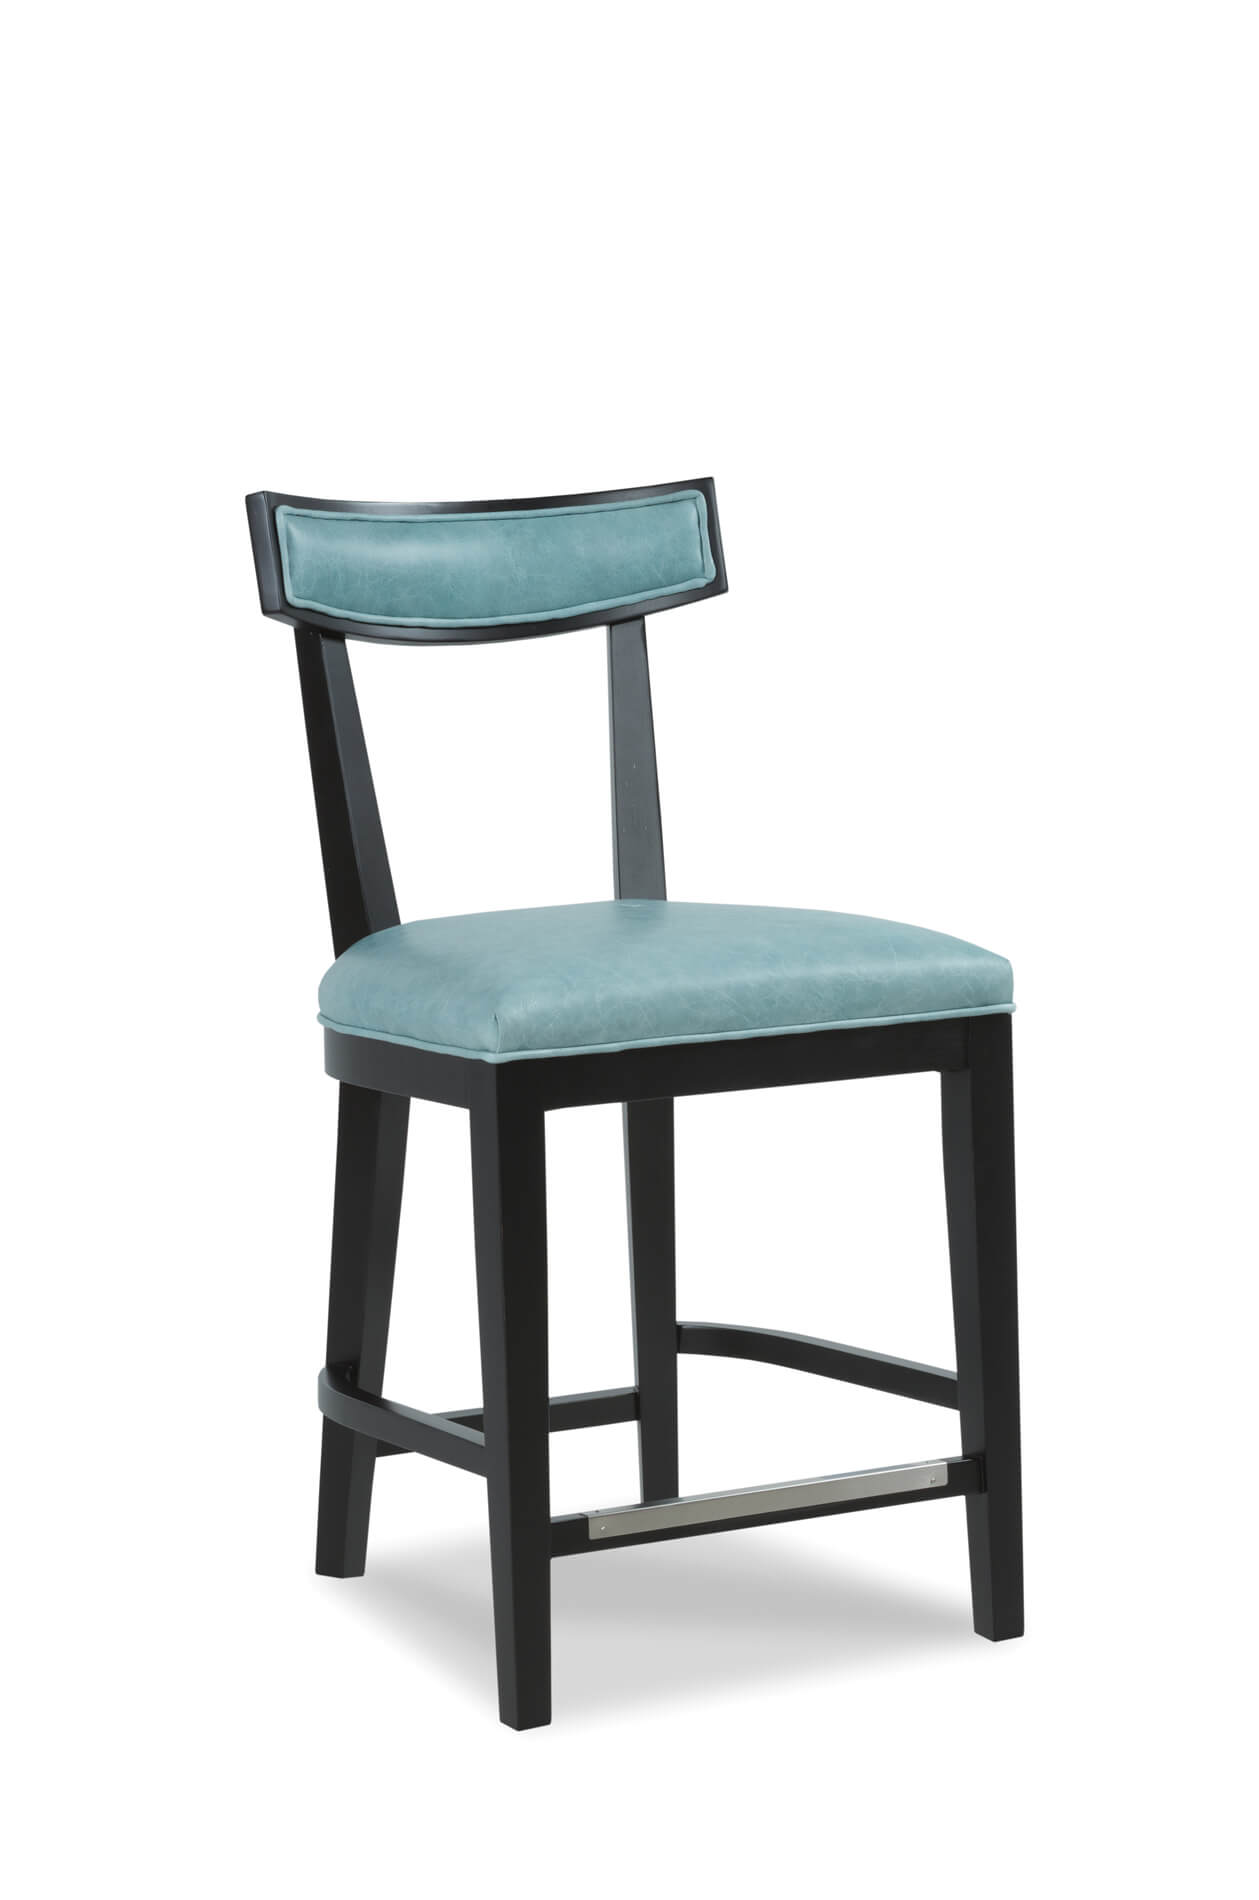 buy douglas wooden bar stool w backrest in leather free shipping. Black Bedroom Furniture Sets. Home Design Ideas